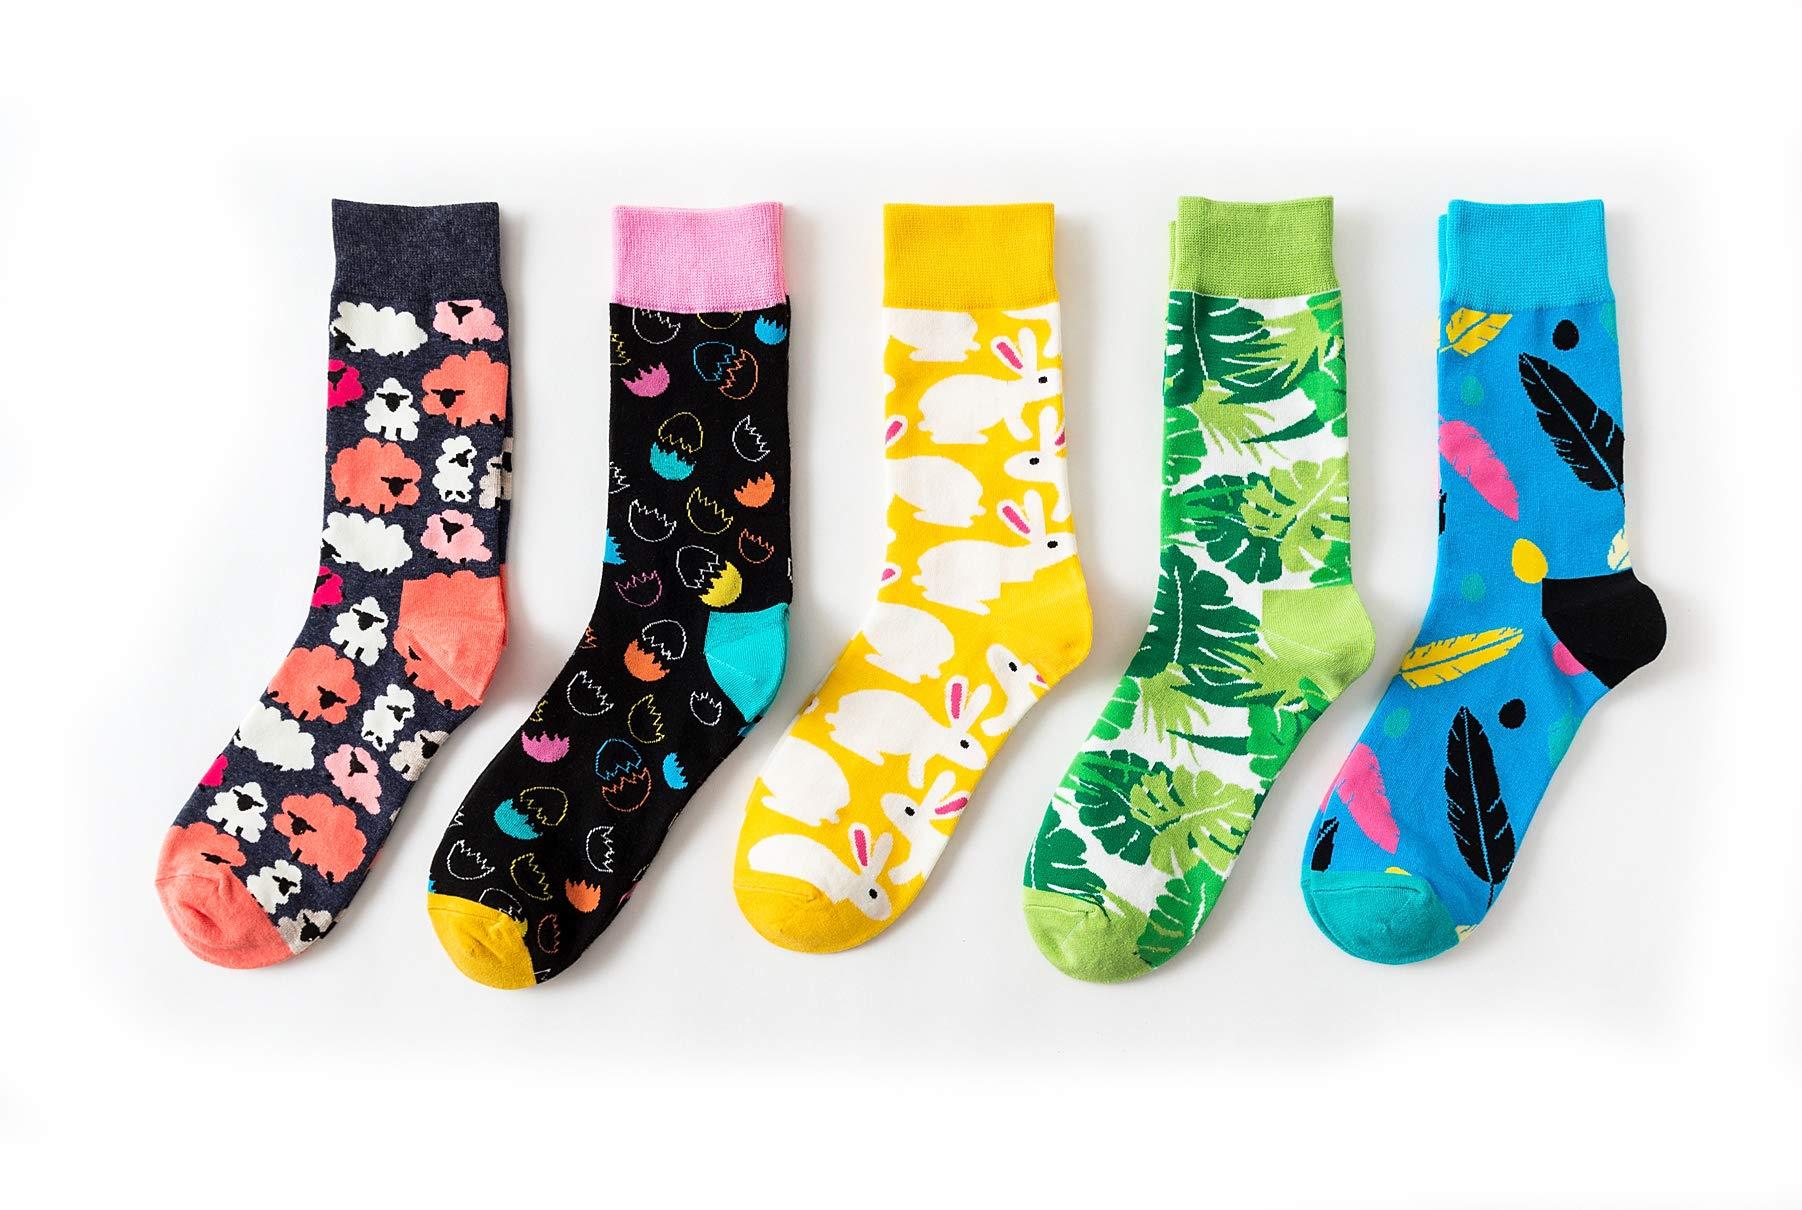 Maplewel Womens Winter Soft Warm Comfort Fun Colorful Crew Socks 5 Pairs